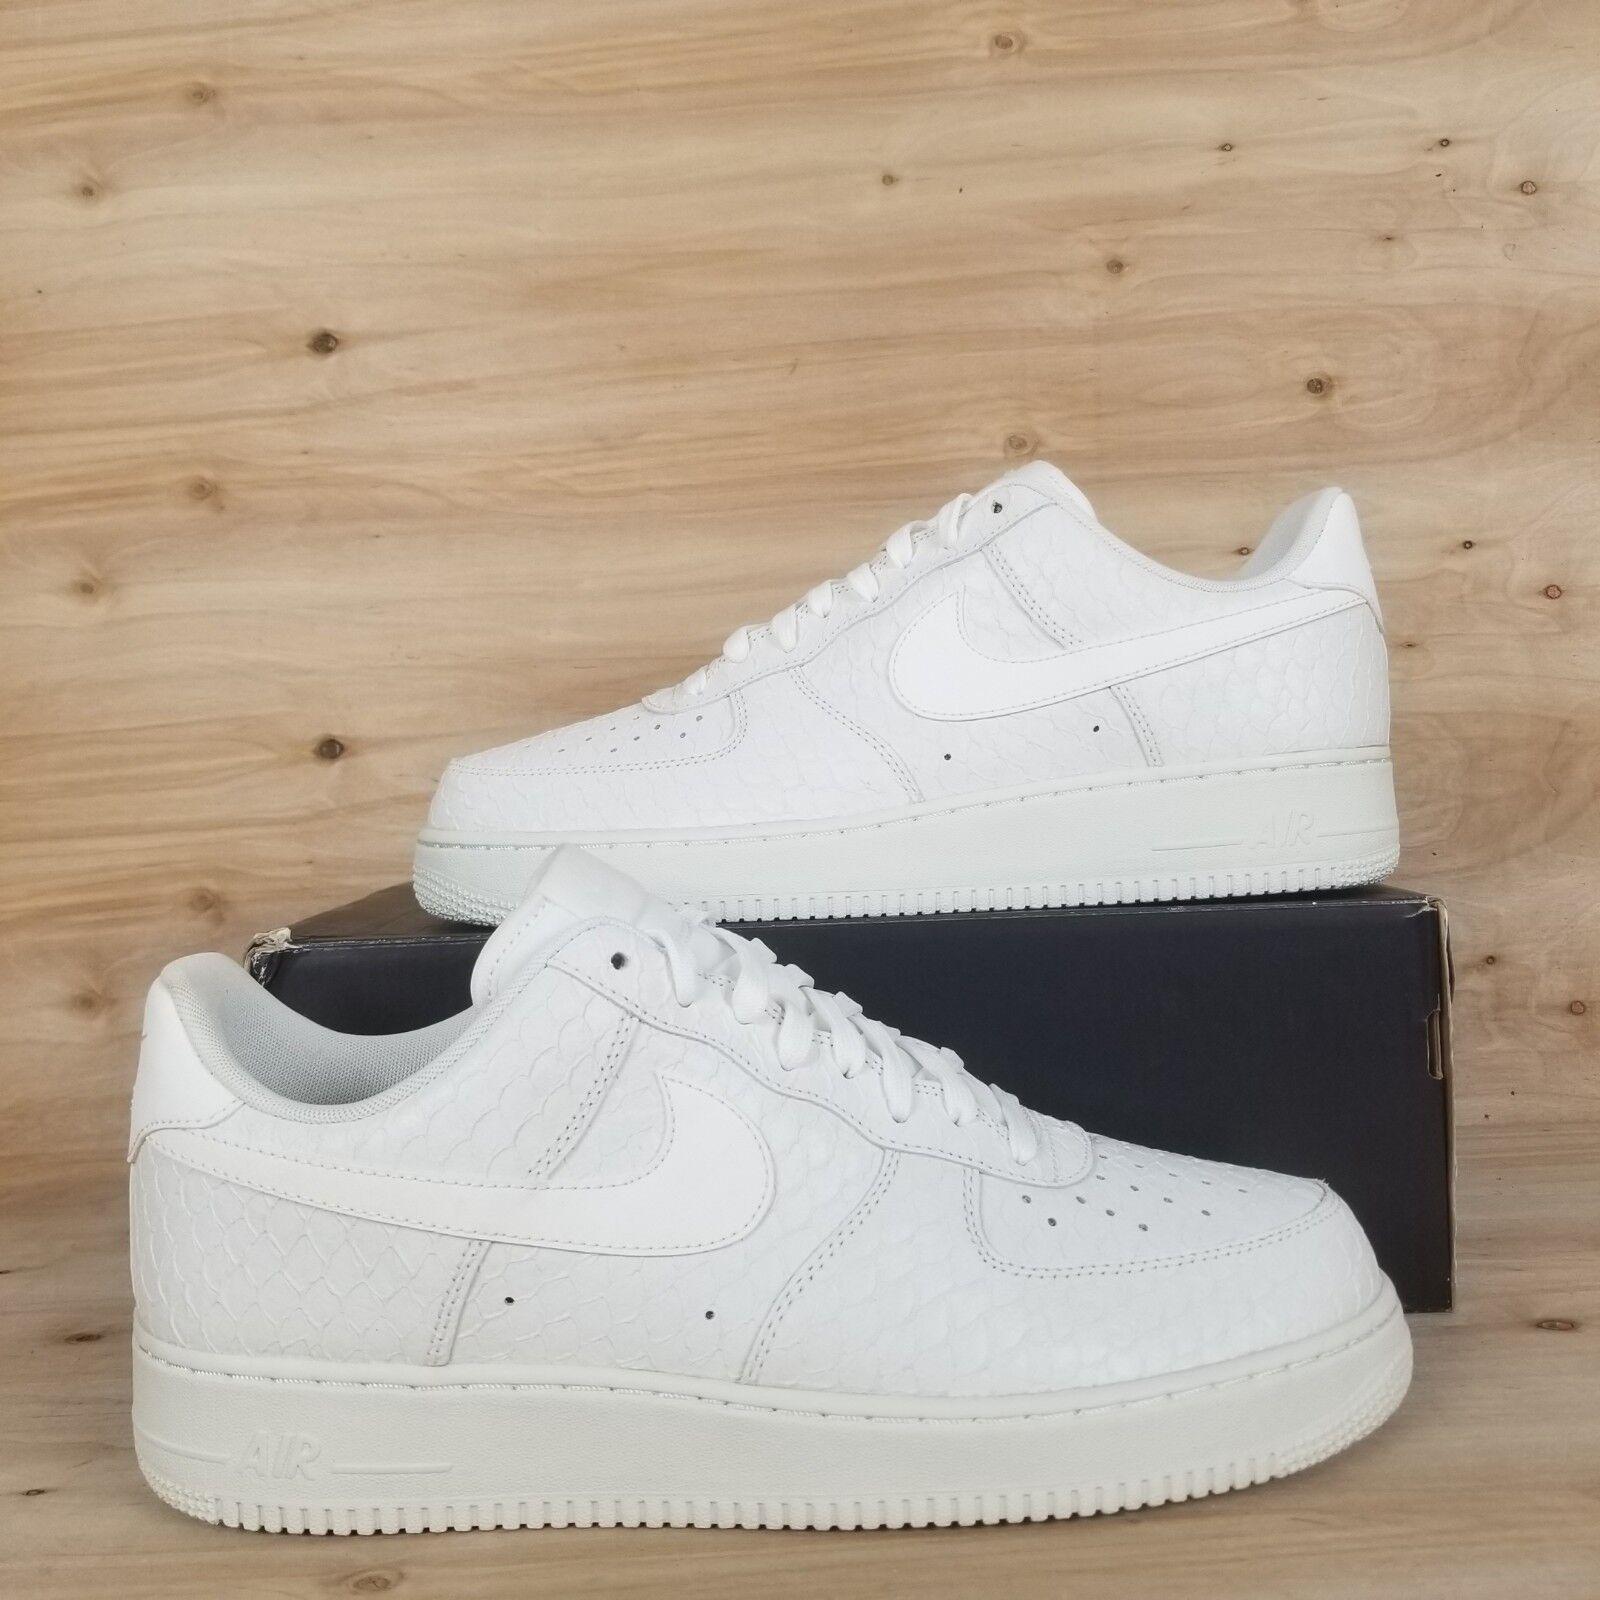 Sneakers 12 Triple Af1 '07 White718152 Lv8 Nike 5 Force 1 Athletic 106Sz Air CErBoeWQdx